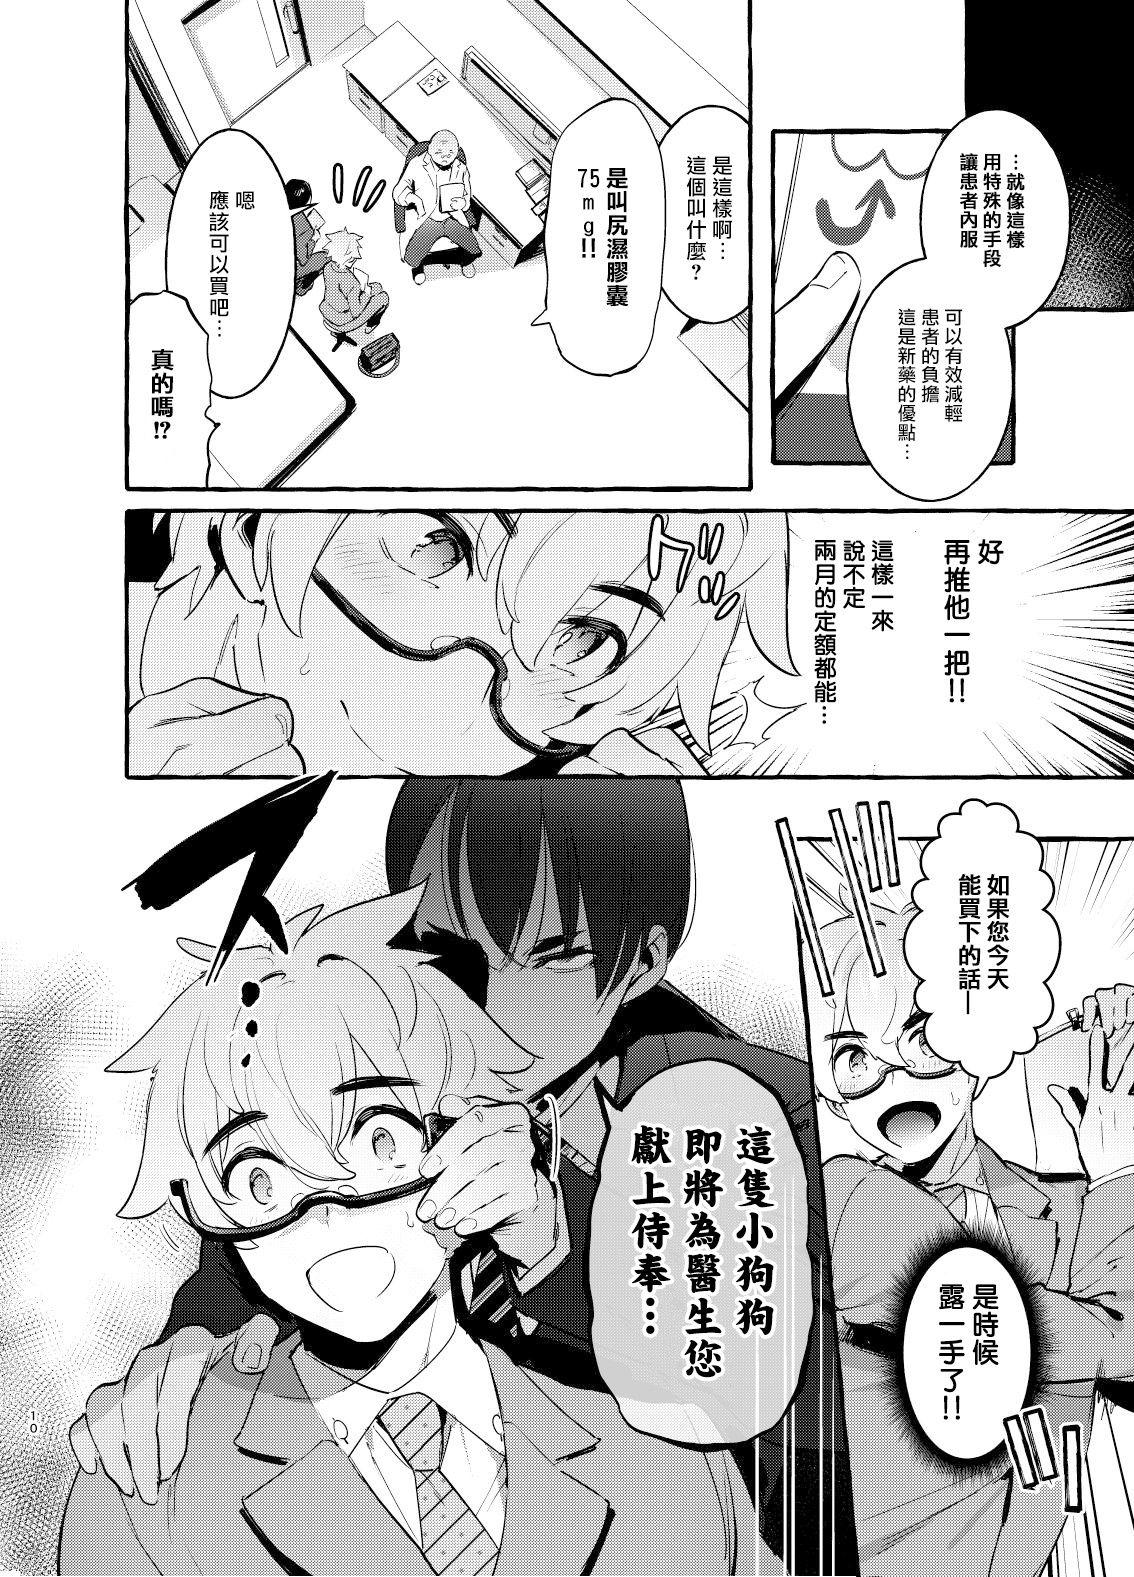 [Otosan no Kurorekishi (Maemukina Do M)]  Wanwan Otou-san   犬系爸爸 01-02 [Chinese] [拾荒者汉化组] [Digital] 10